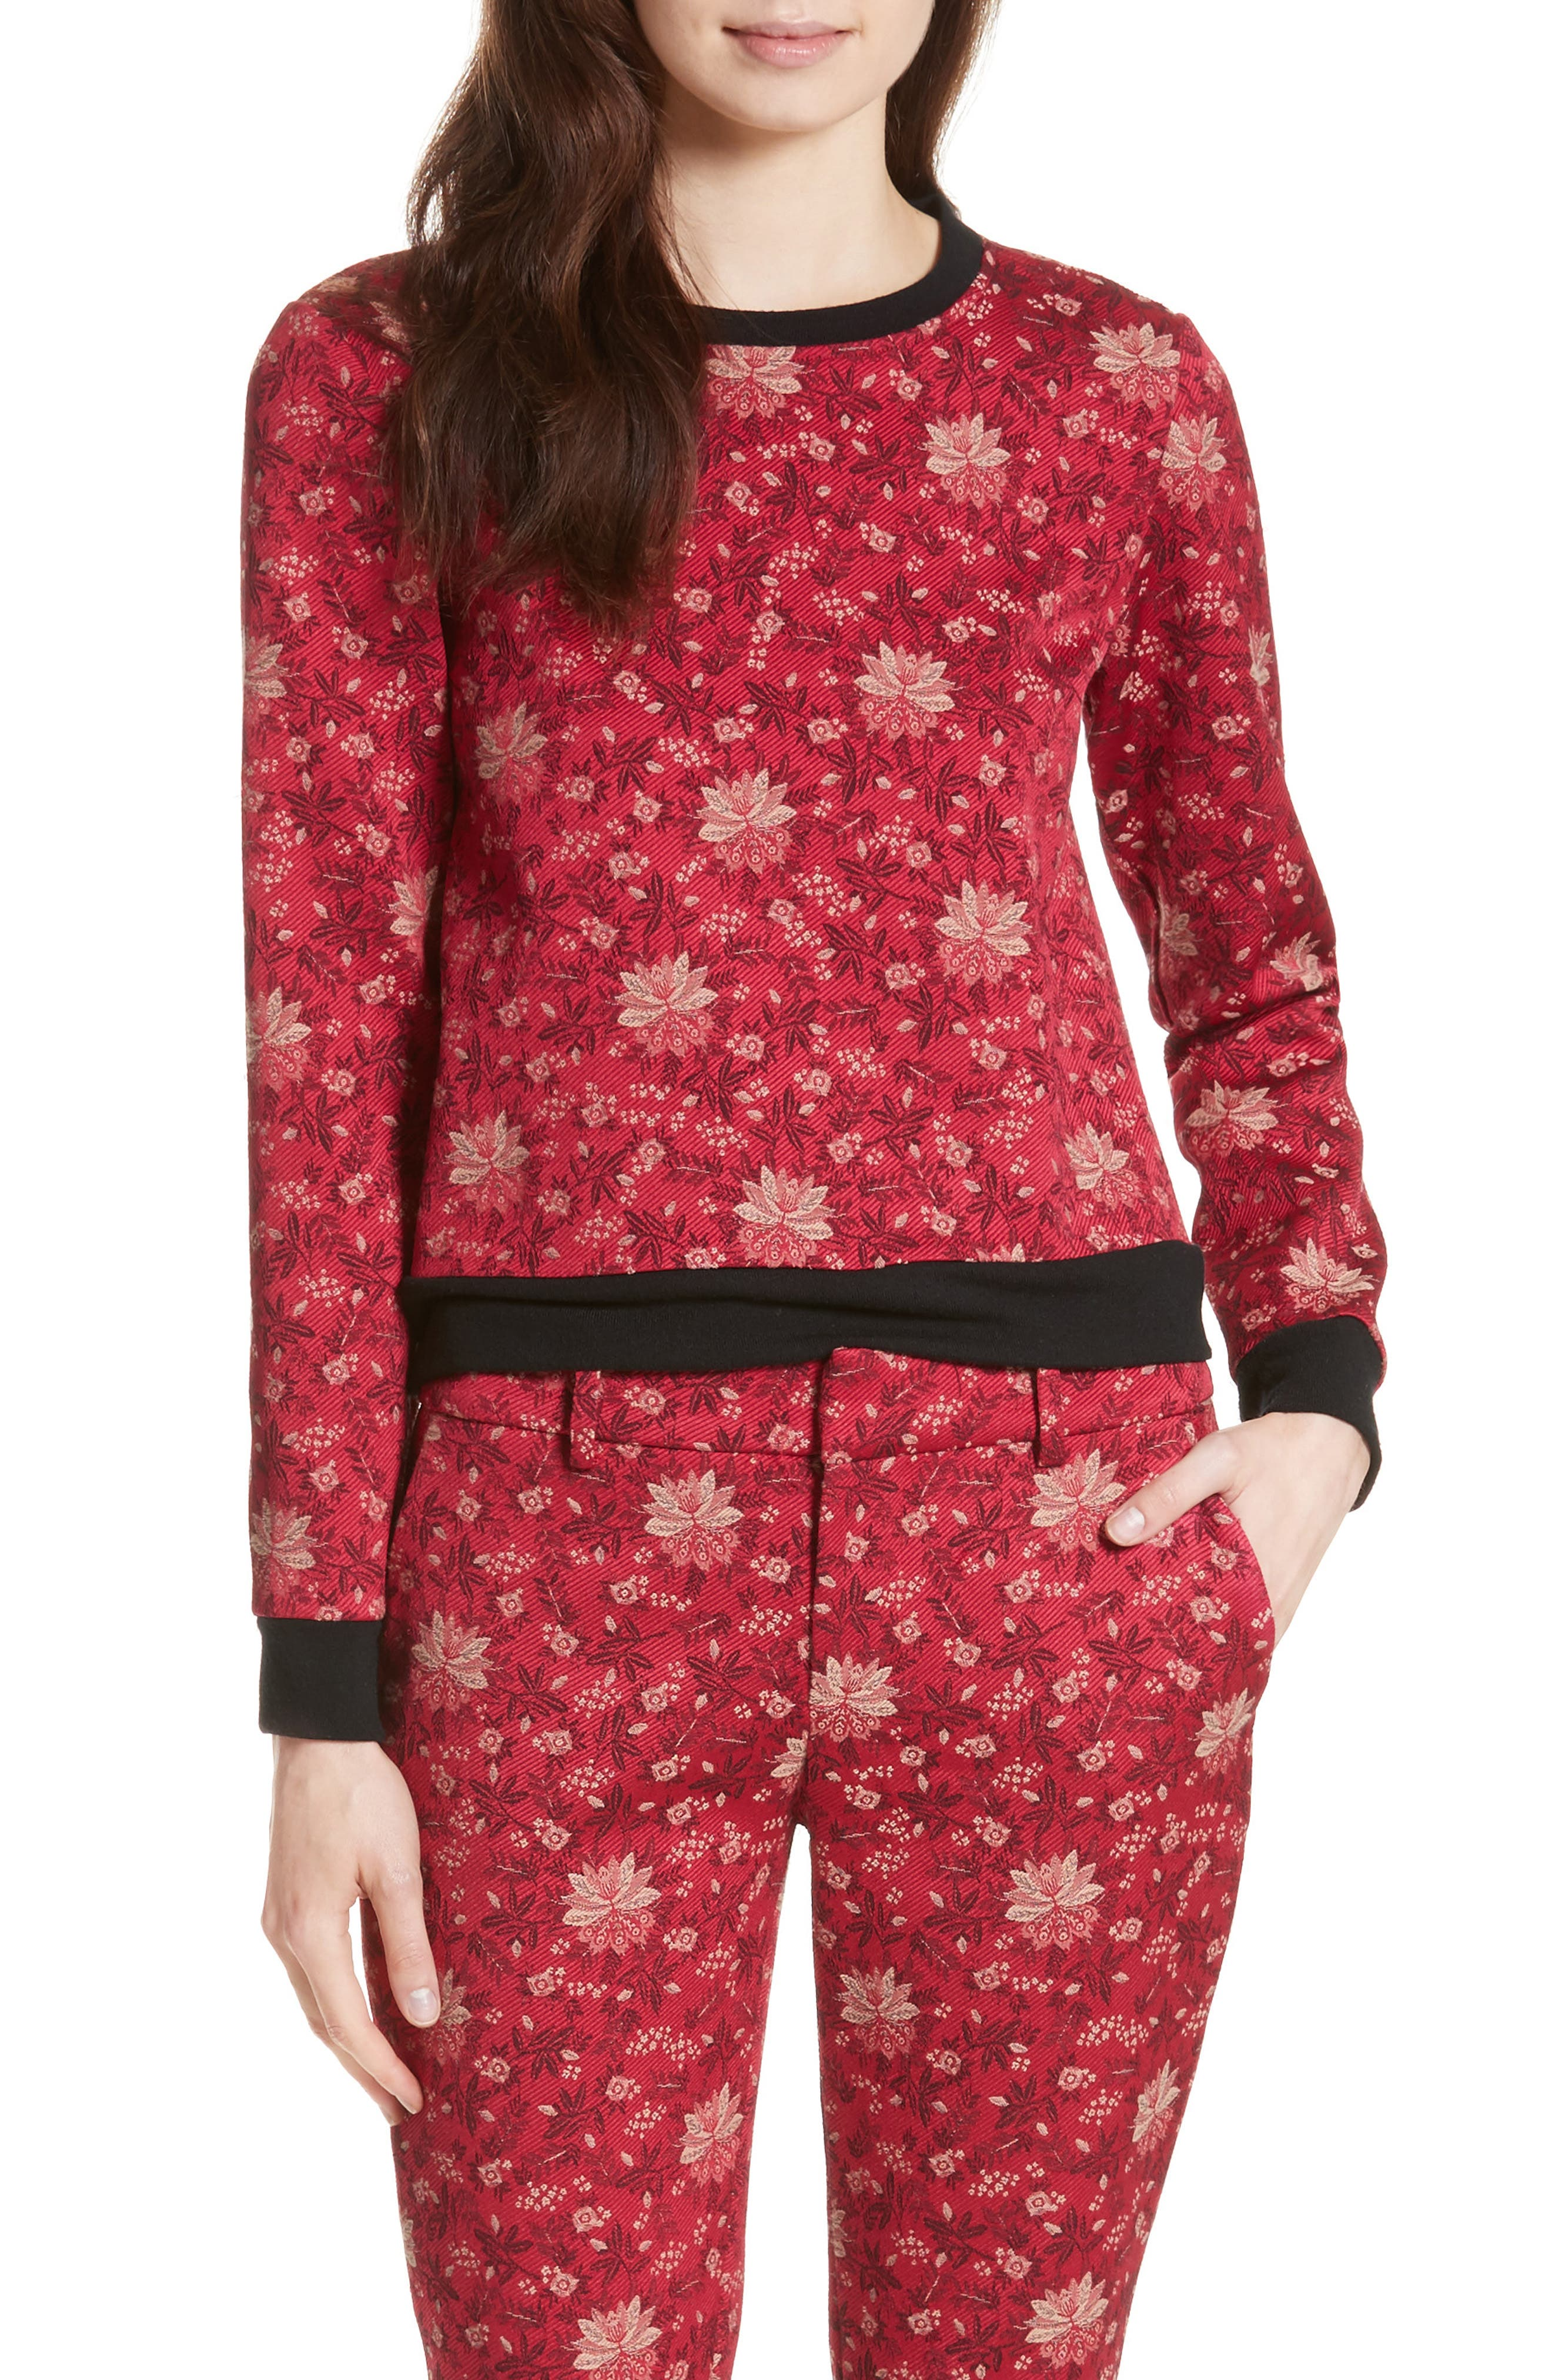 Marylou Floral Jacquard Sweatshirt,                         Main,                         color, 650